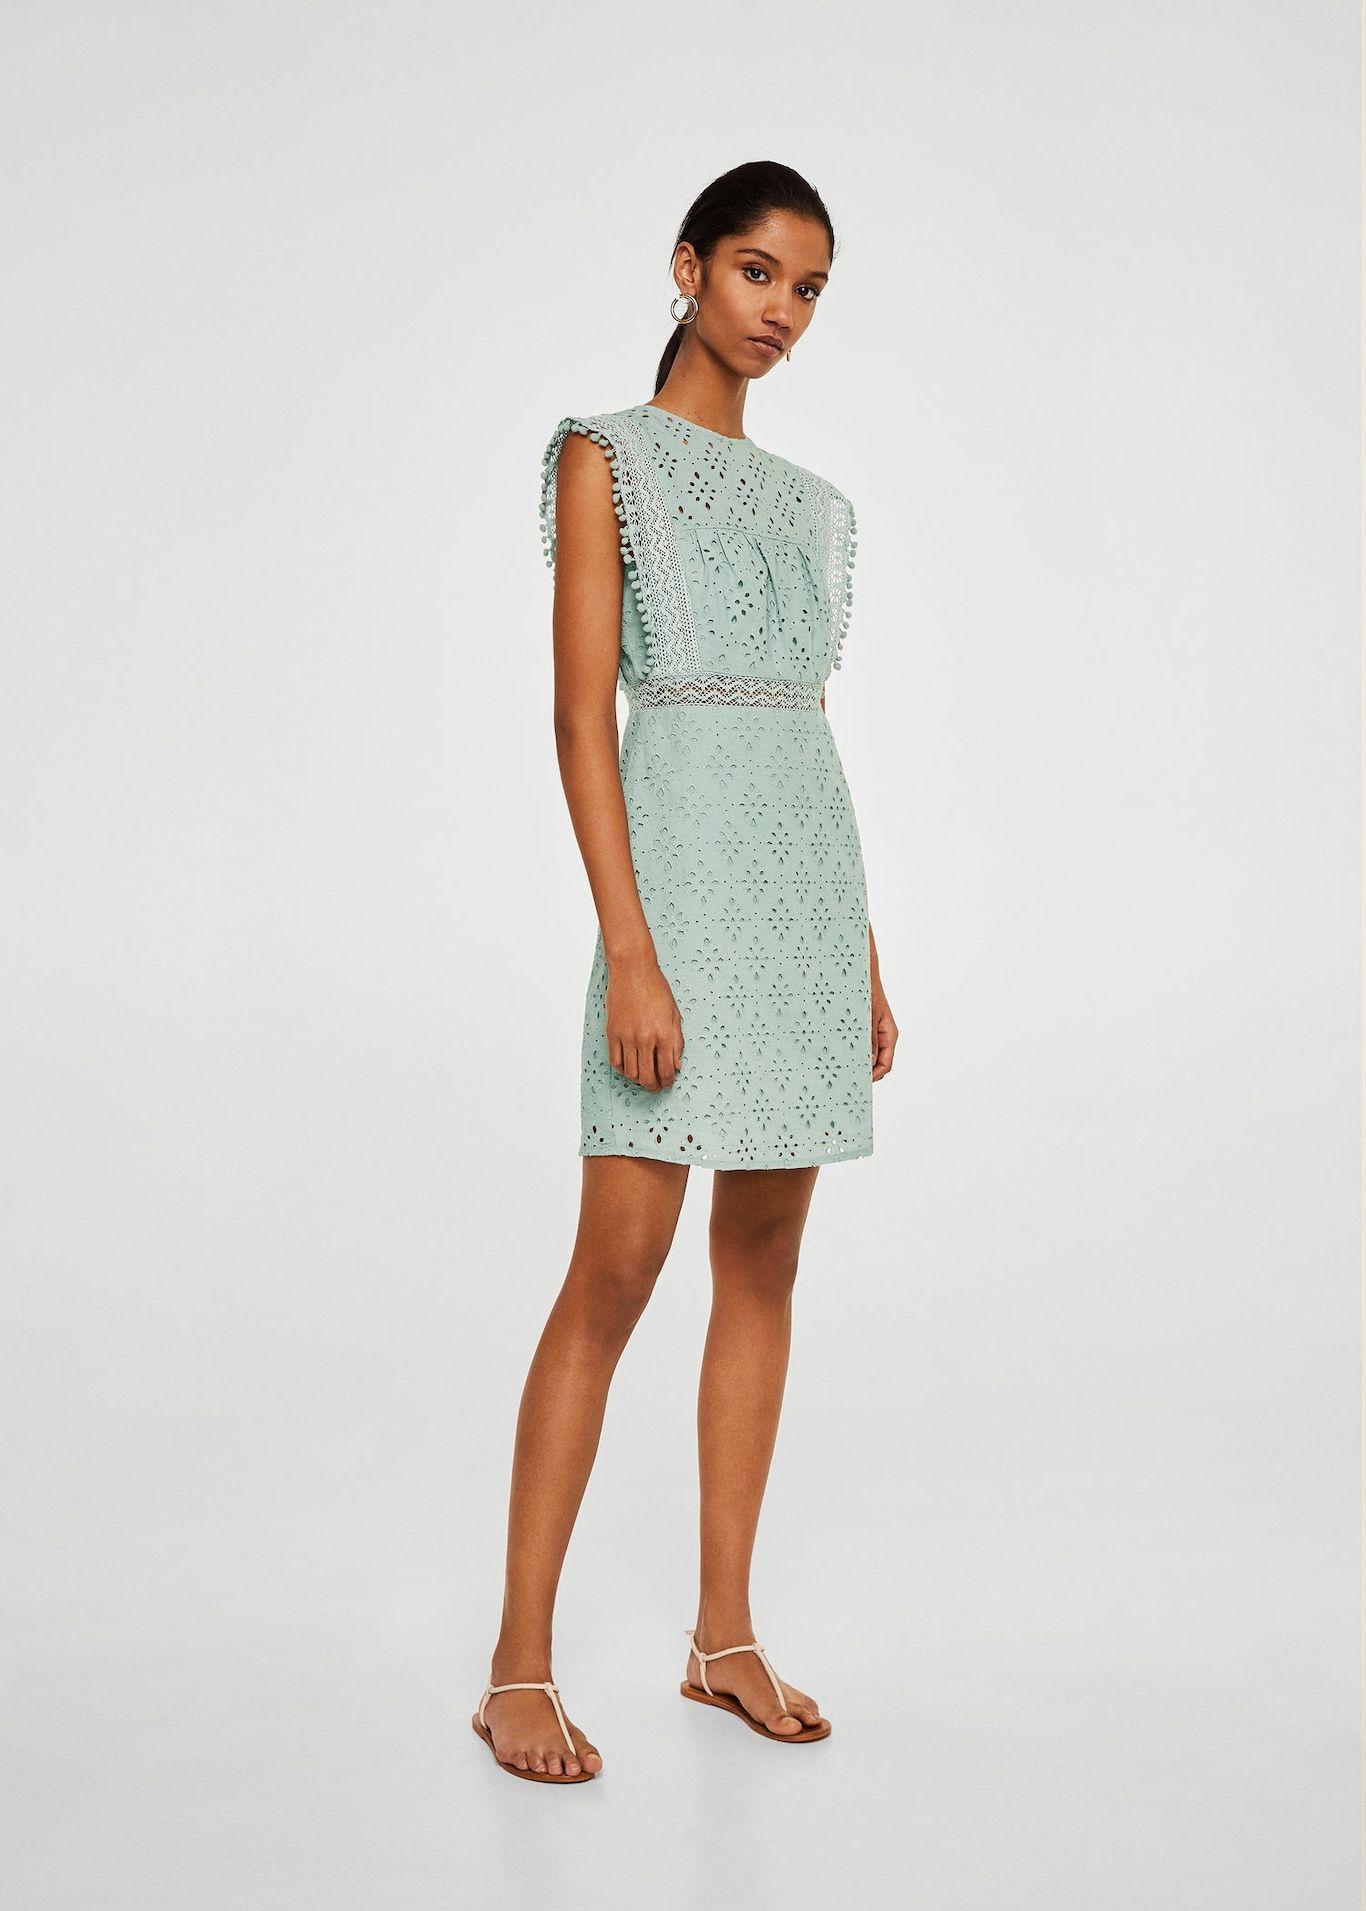 Delikli Koton Elbise Kadin Dress In 2019 Dresses Cotton Dresses Day Dresses